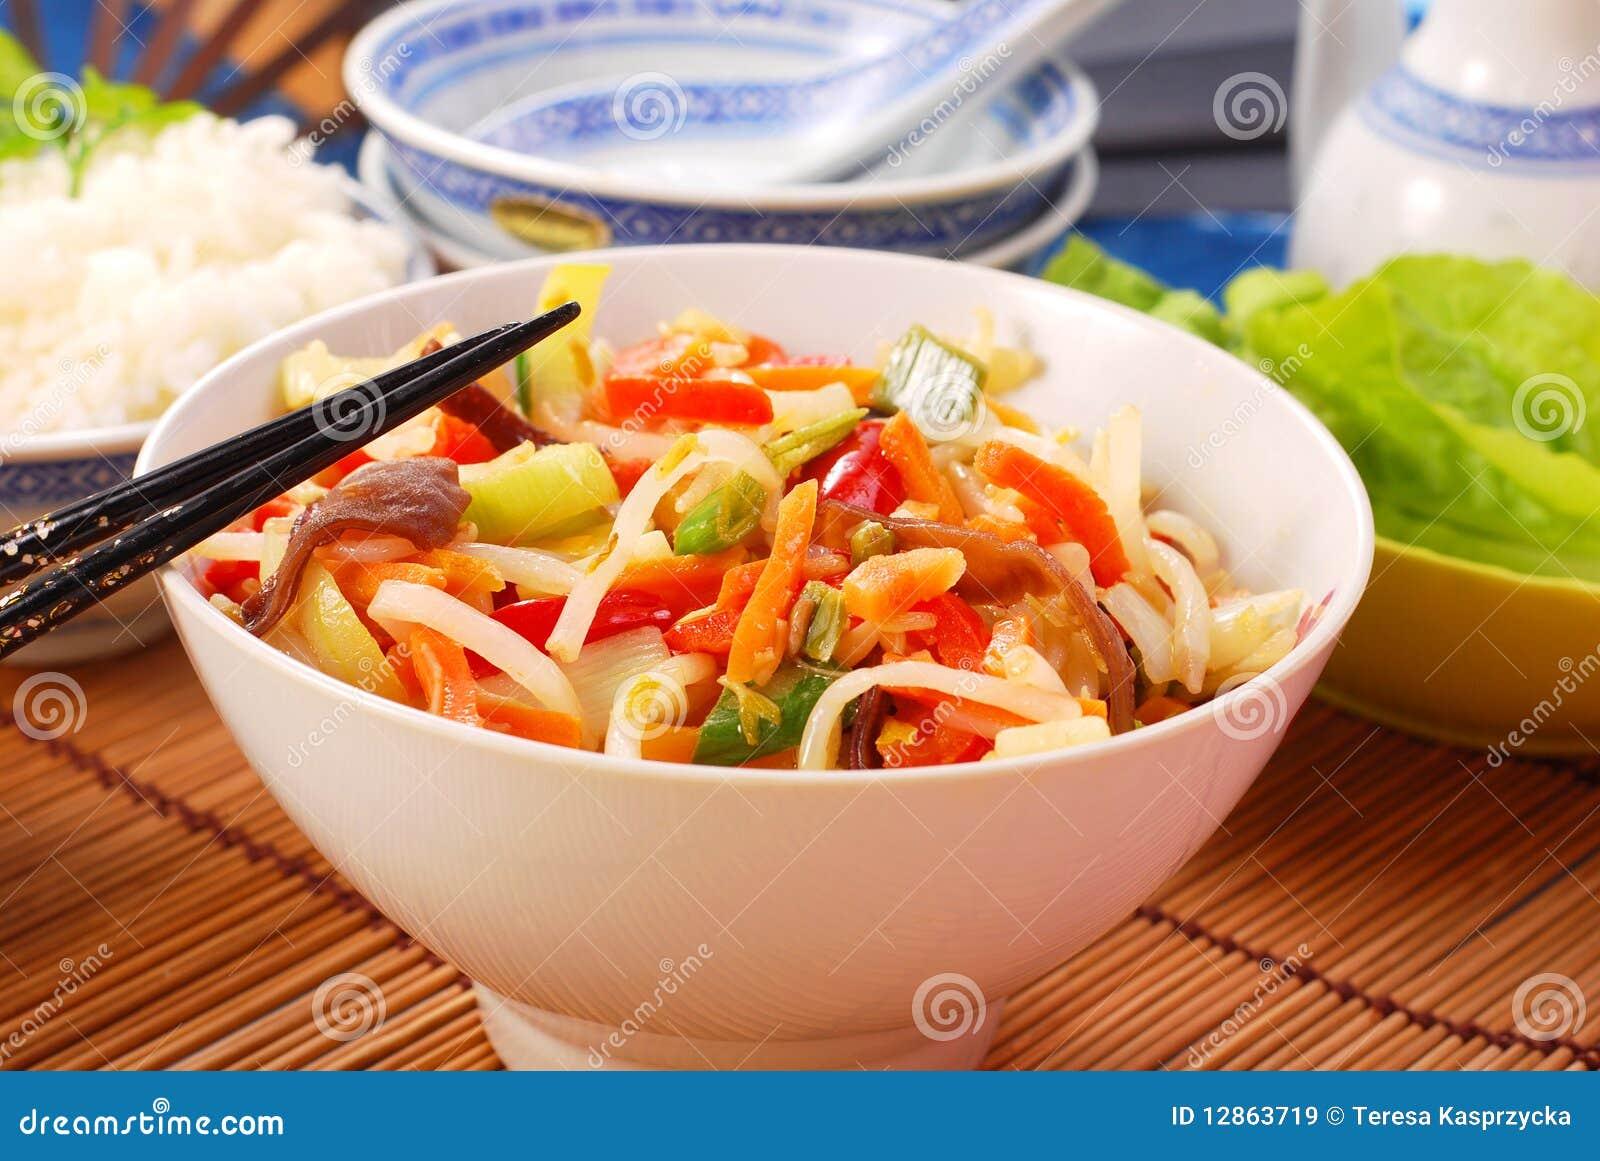 Alimento de China